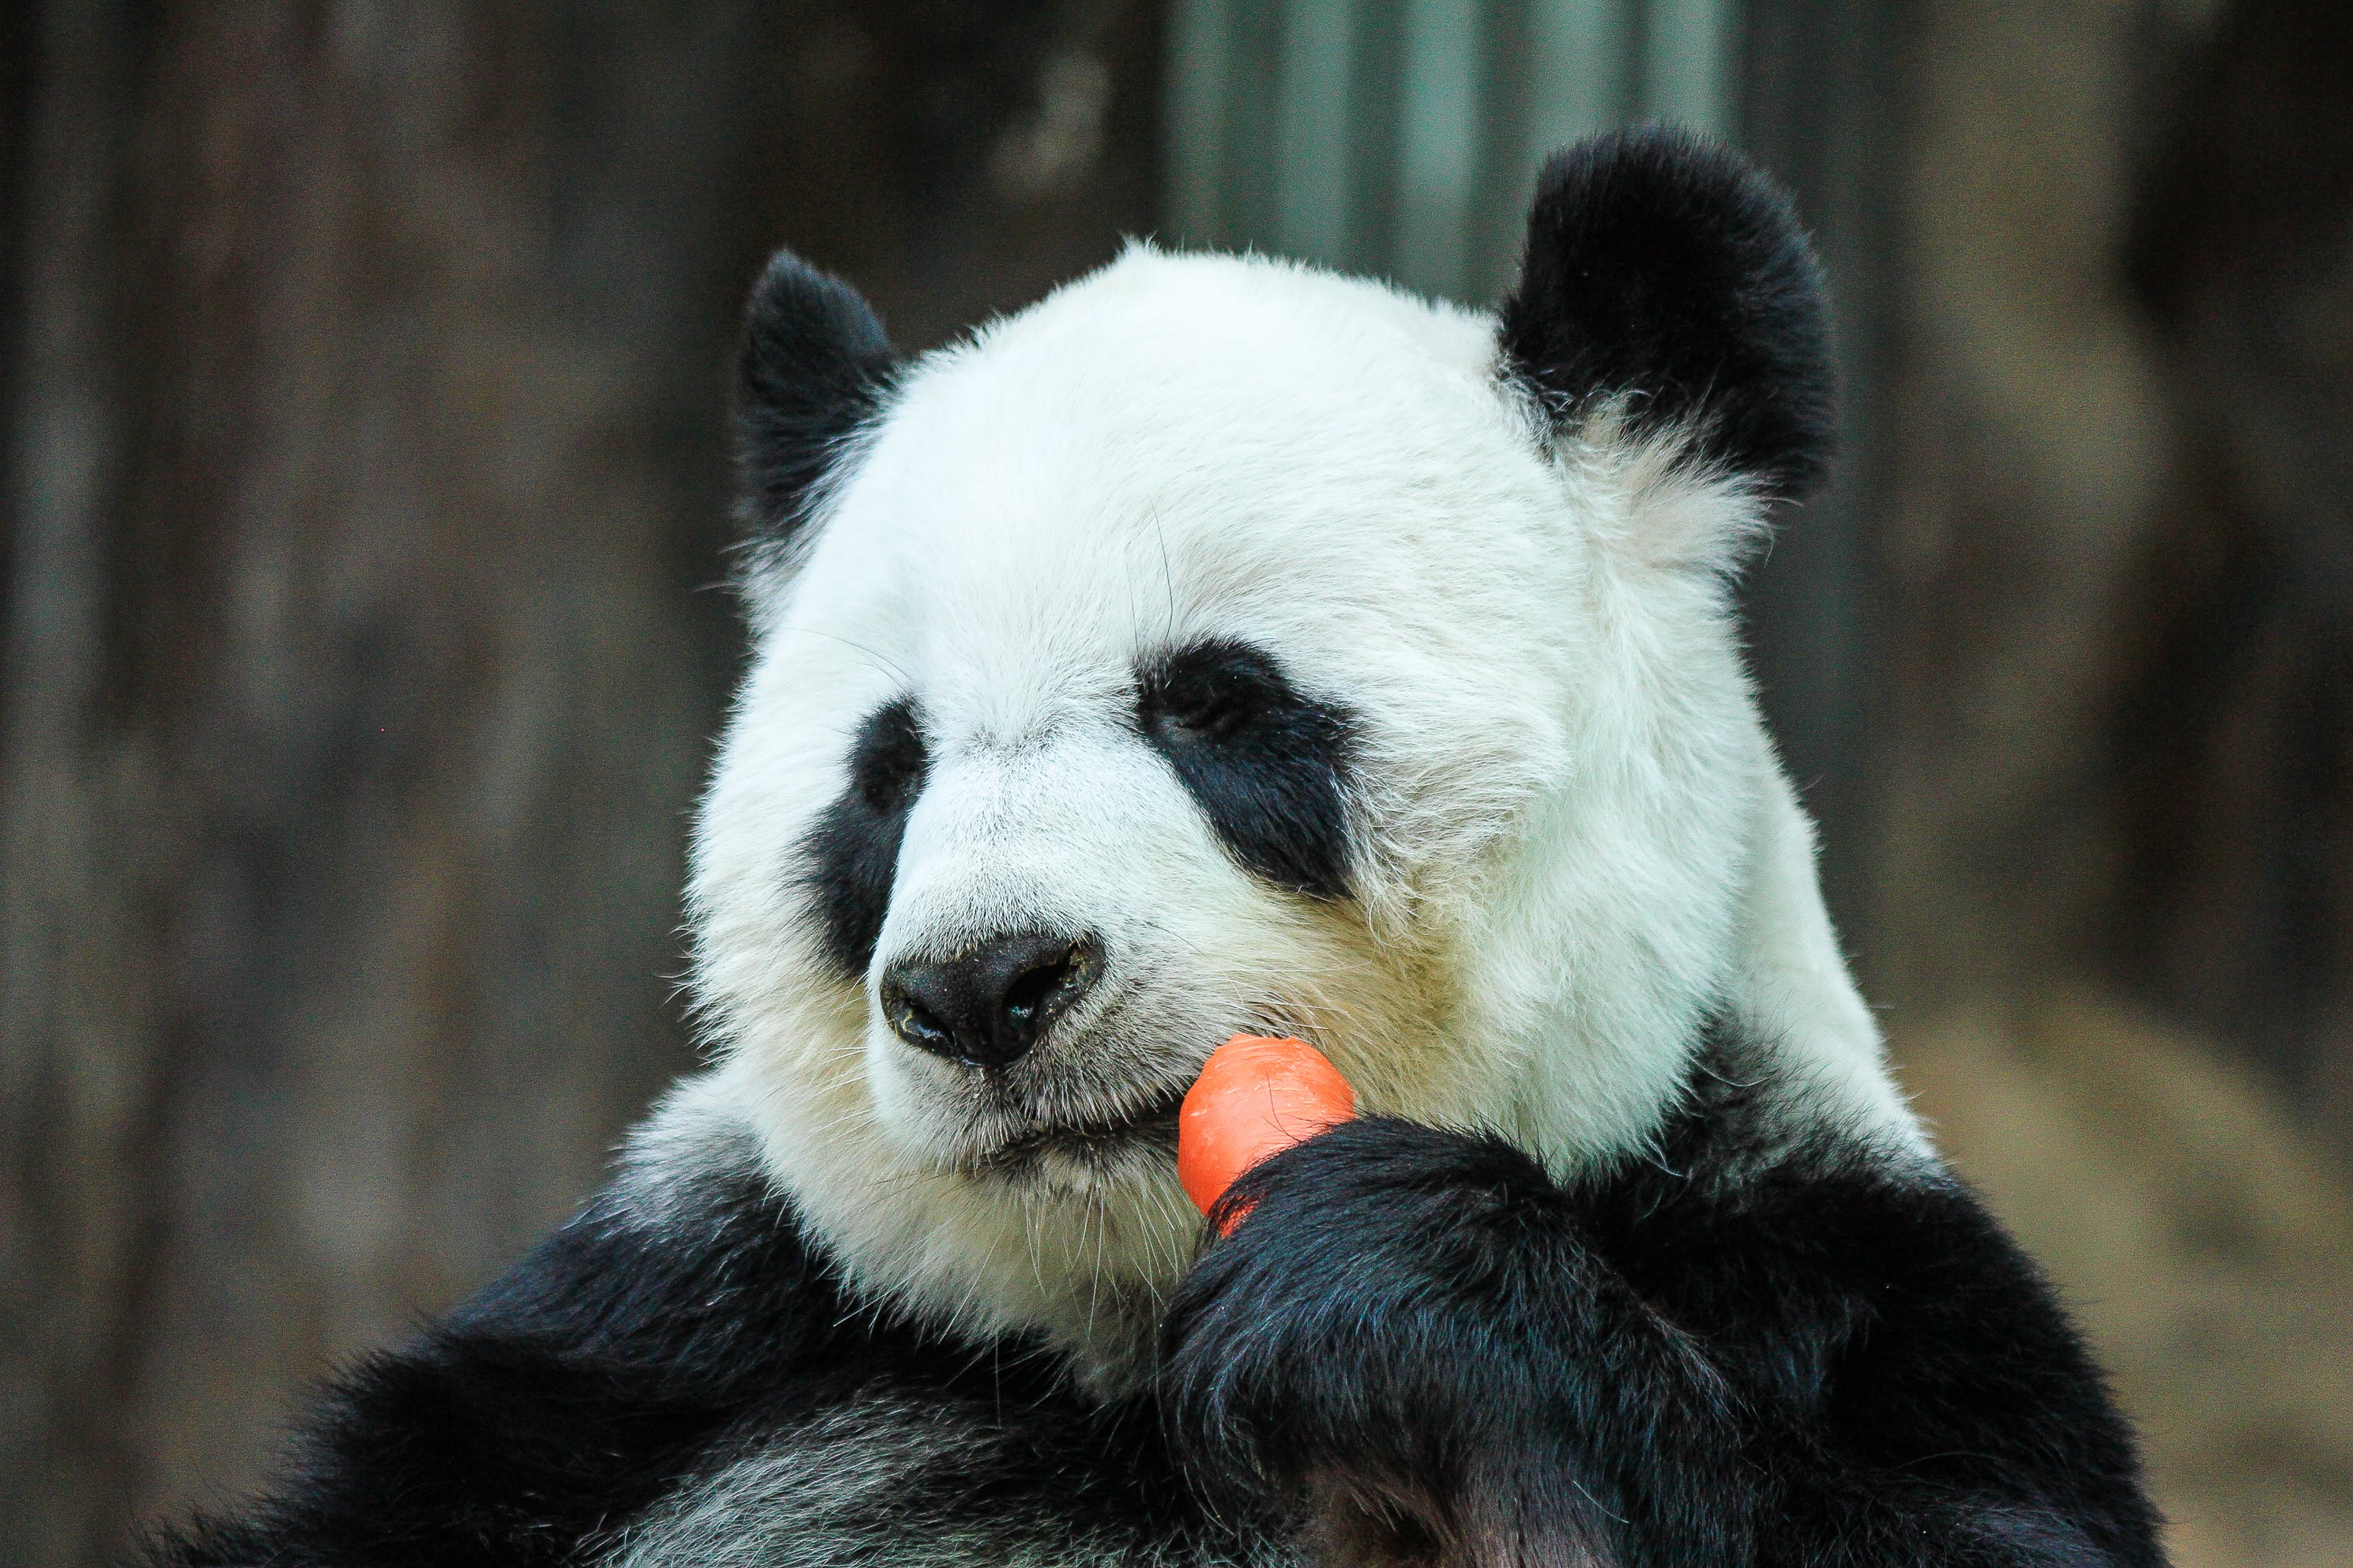 Free stock photo of animal, zoo, travel, eat